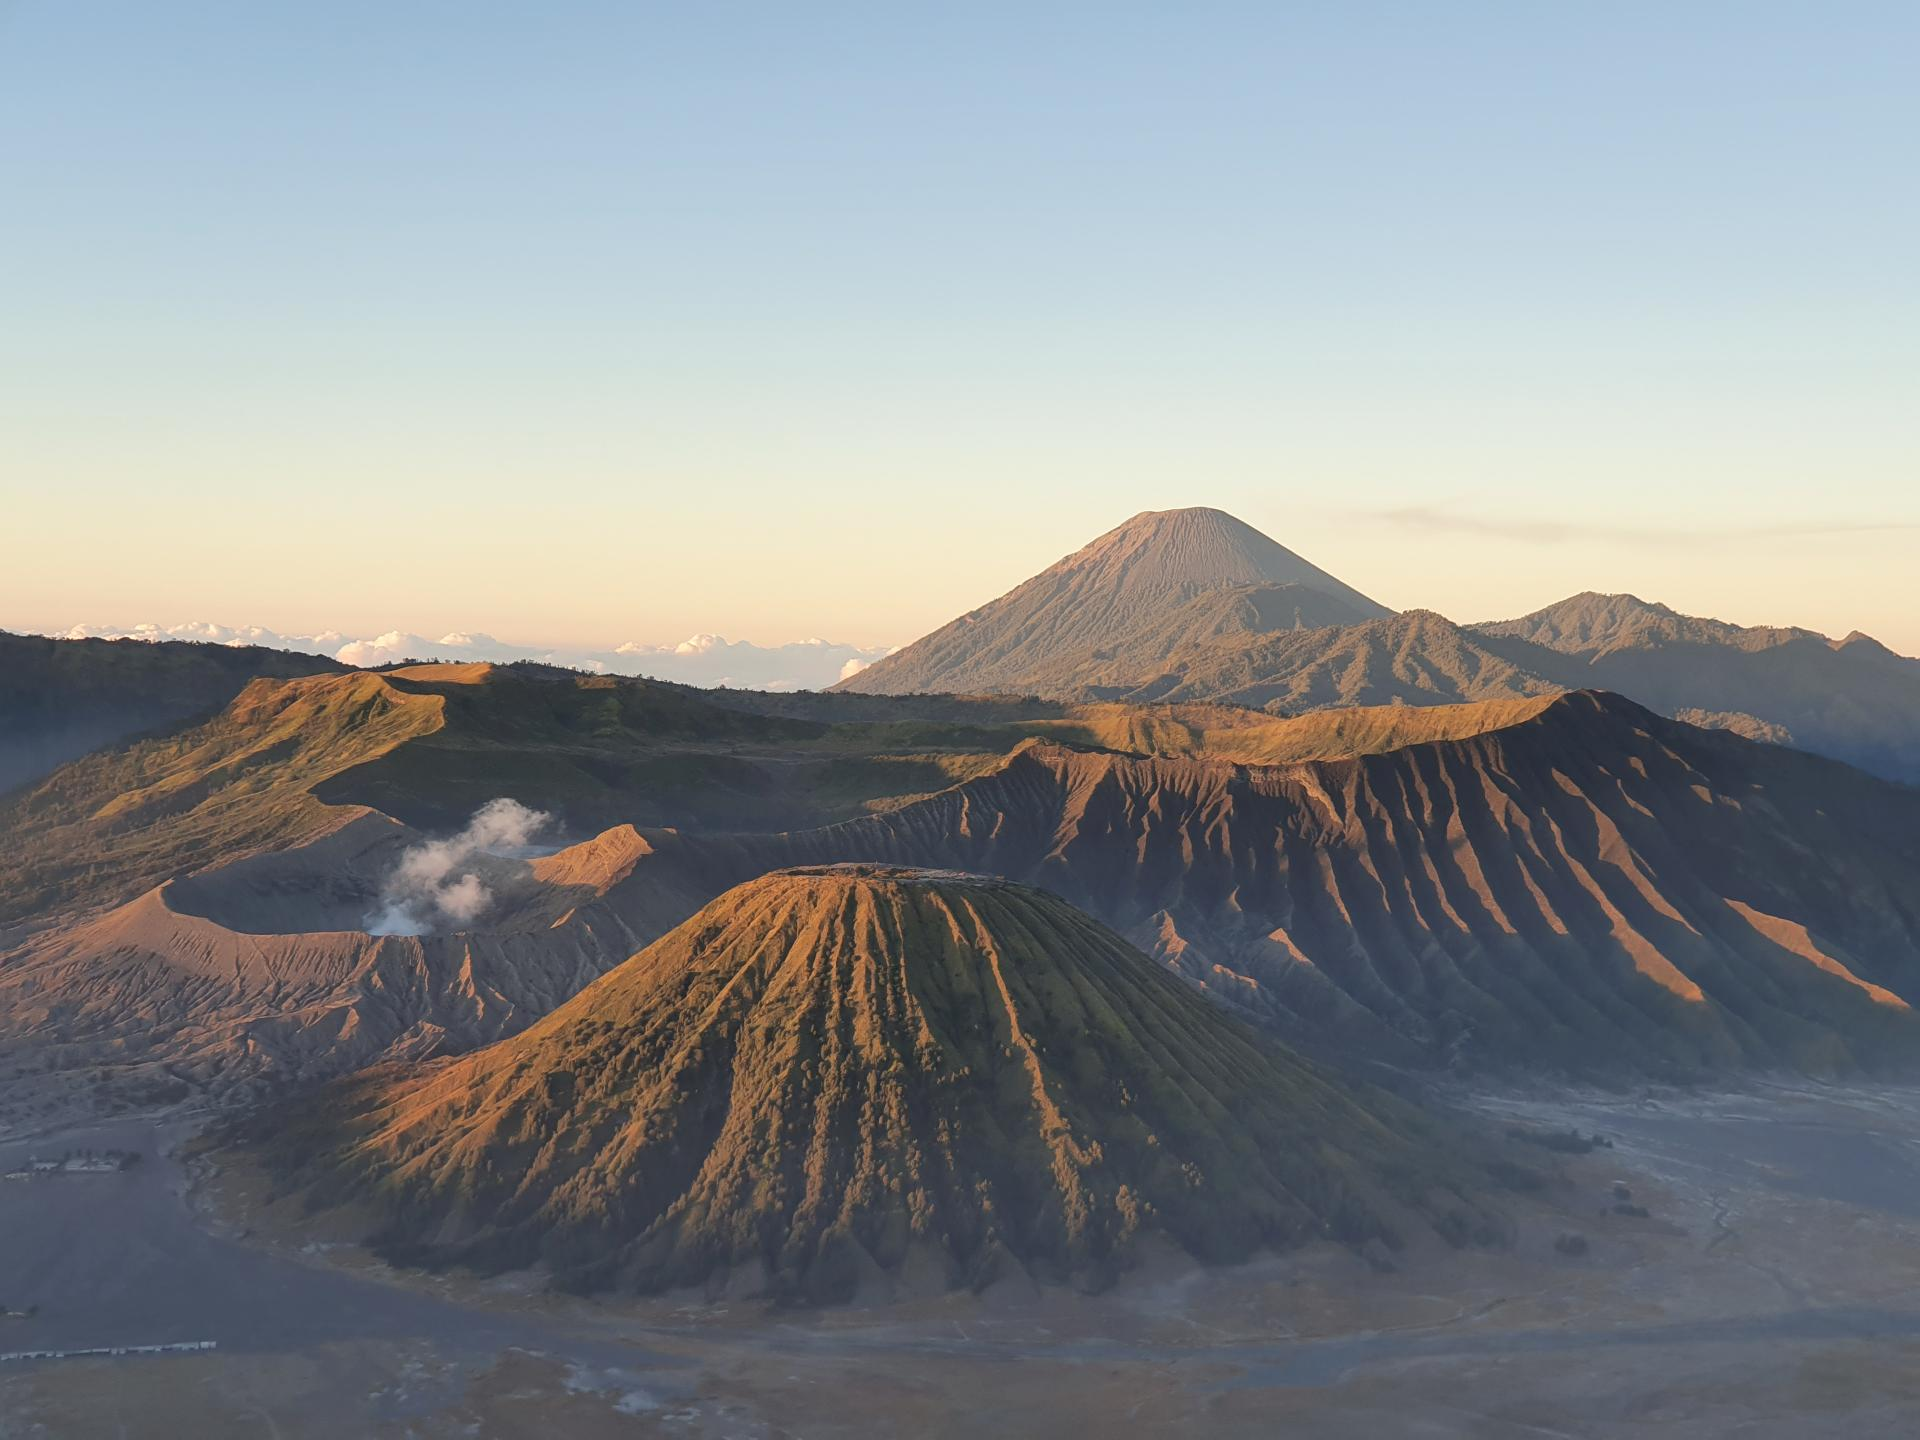 Вулканы Бромо, Семеру, Баток в кальдерре Тенгер